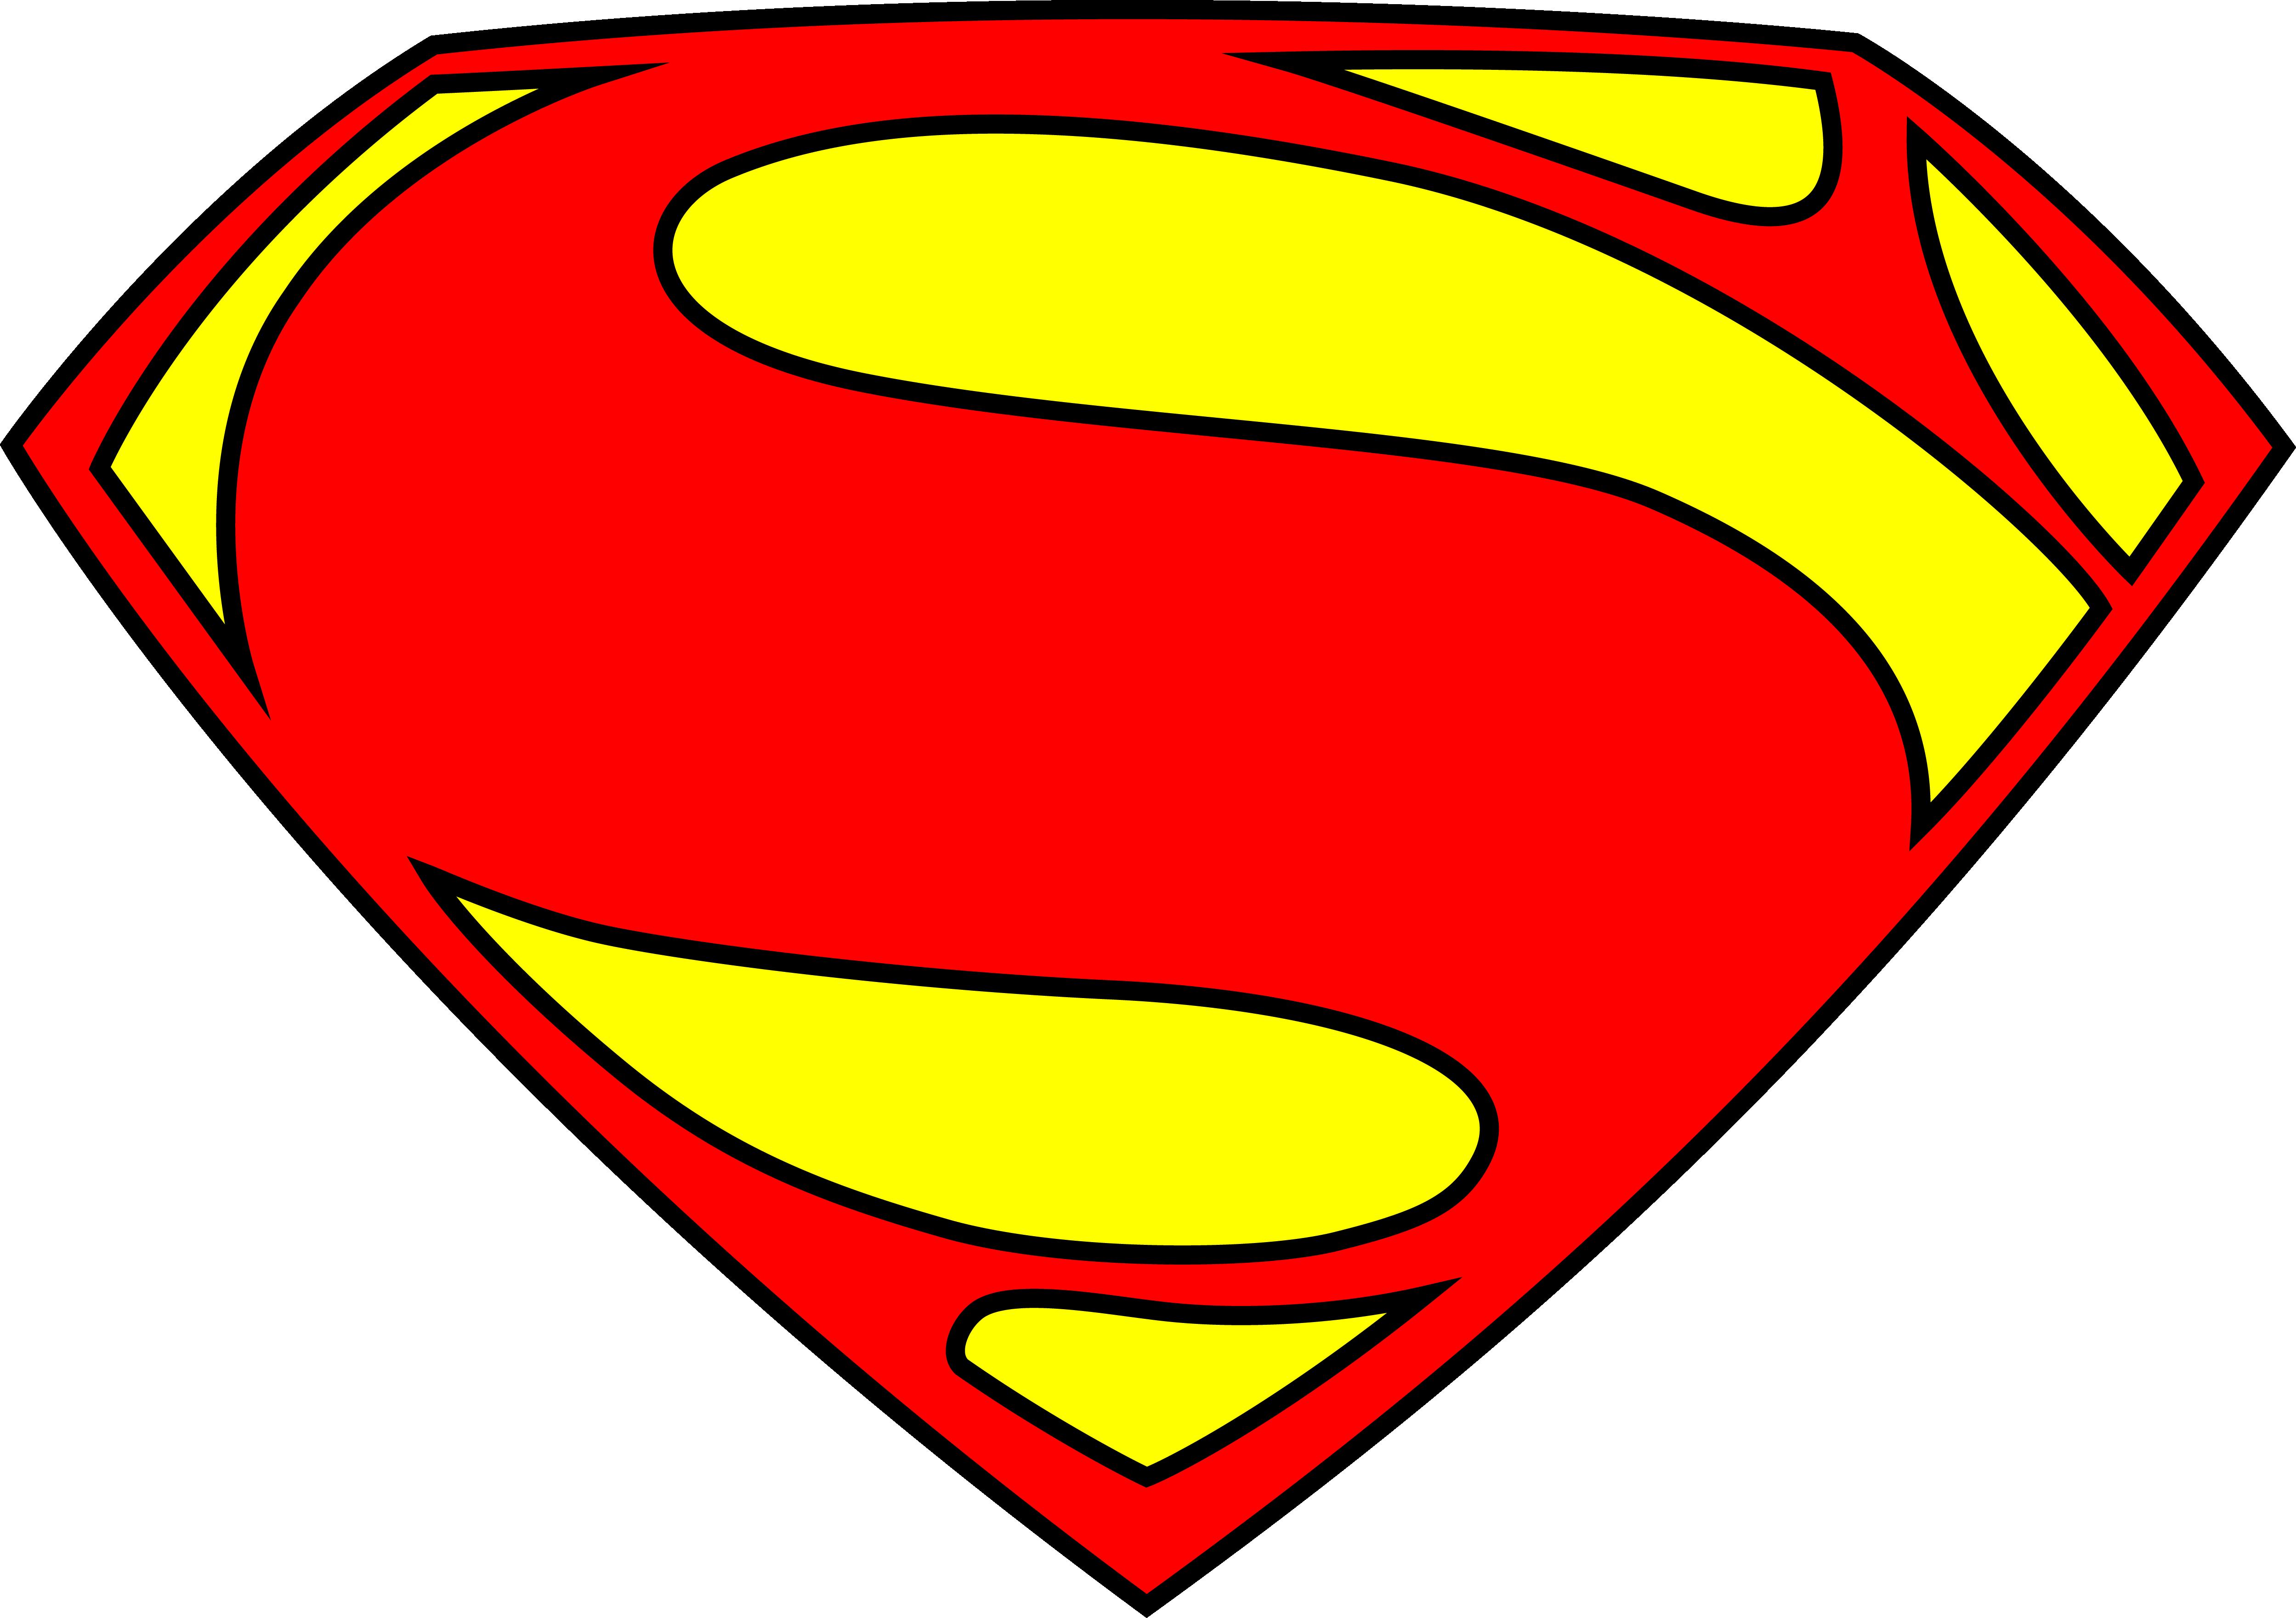 superman logo by benokil - photo #35